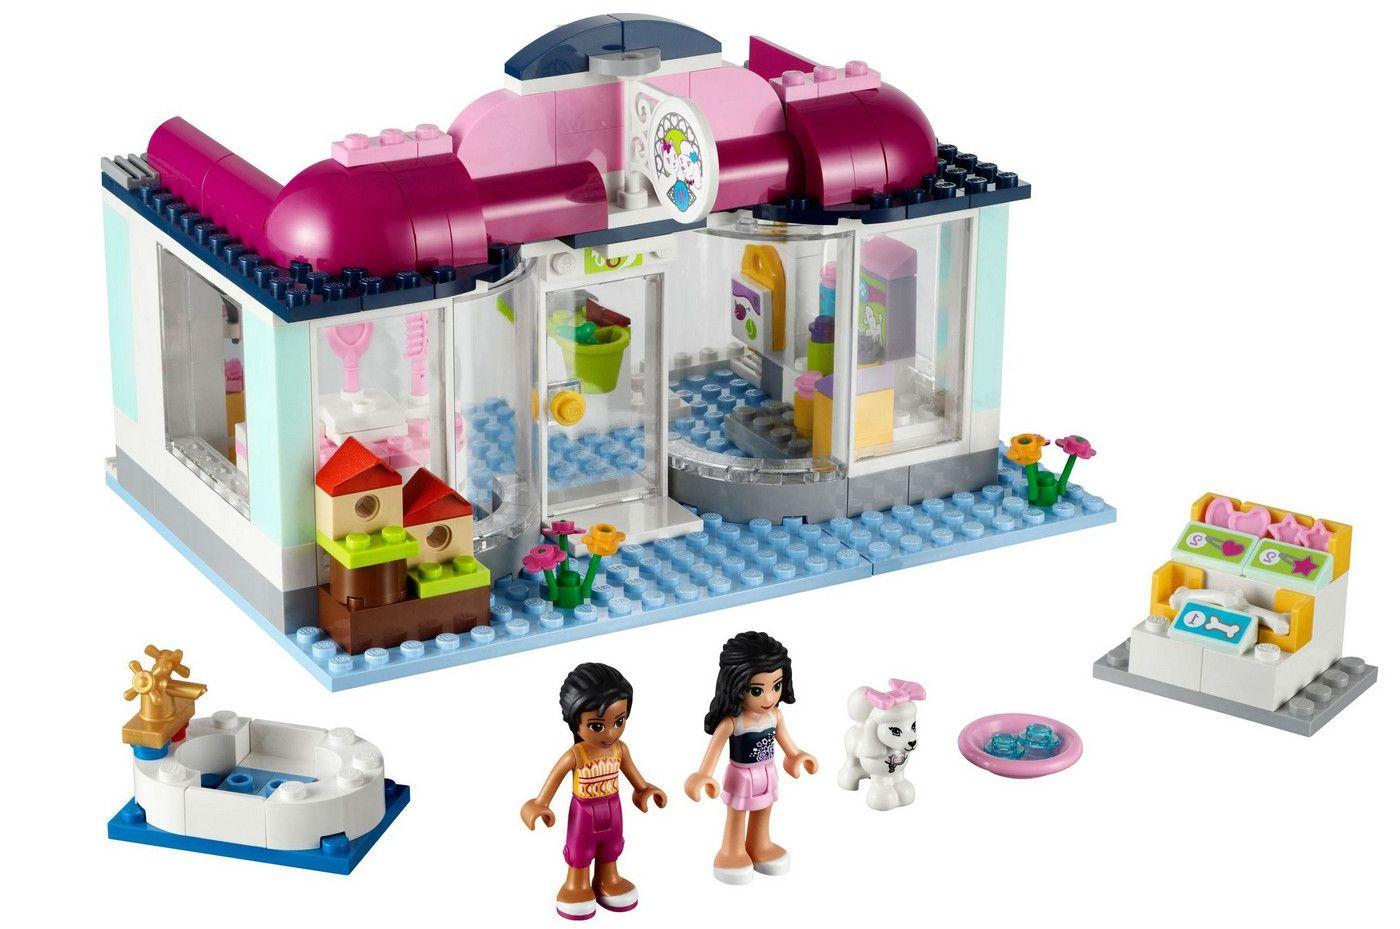 Lego 41007 Friends Heartlake Pet Salon I Brick City